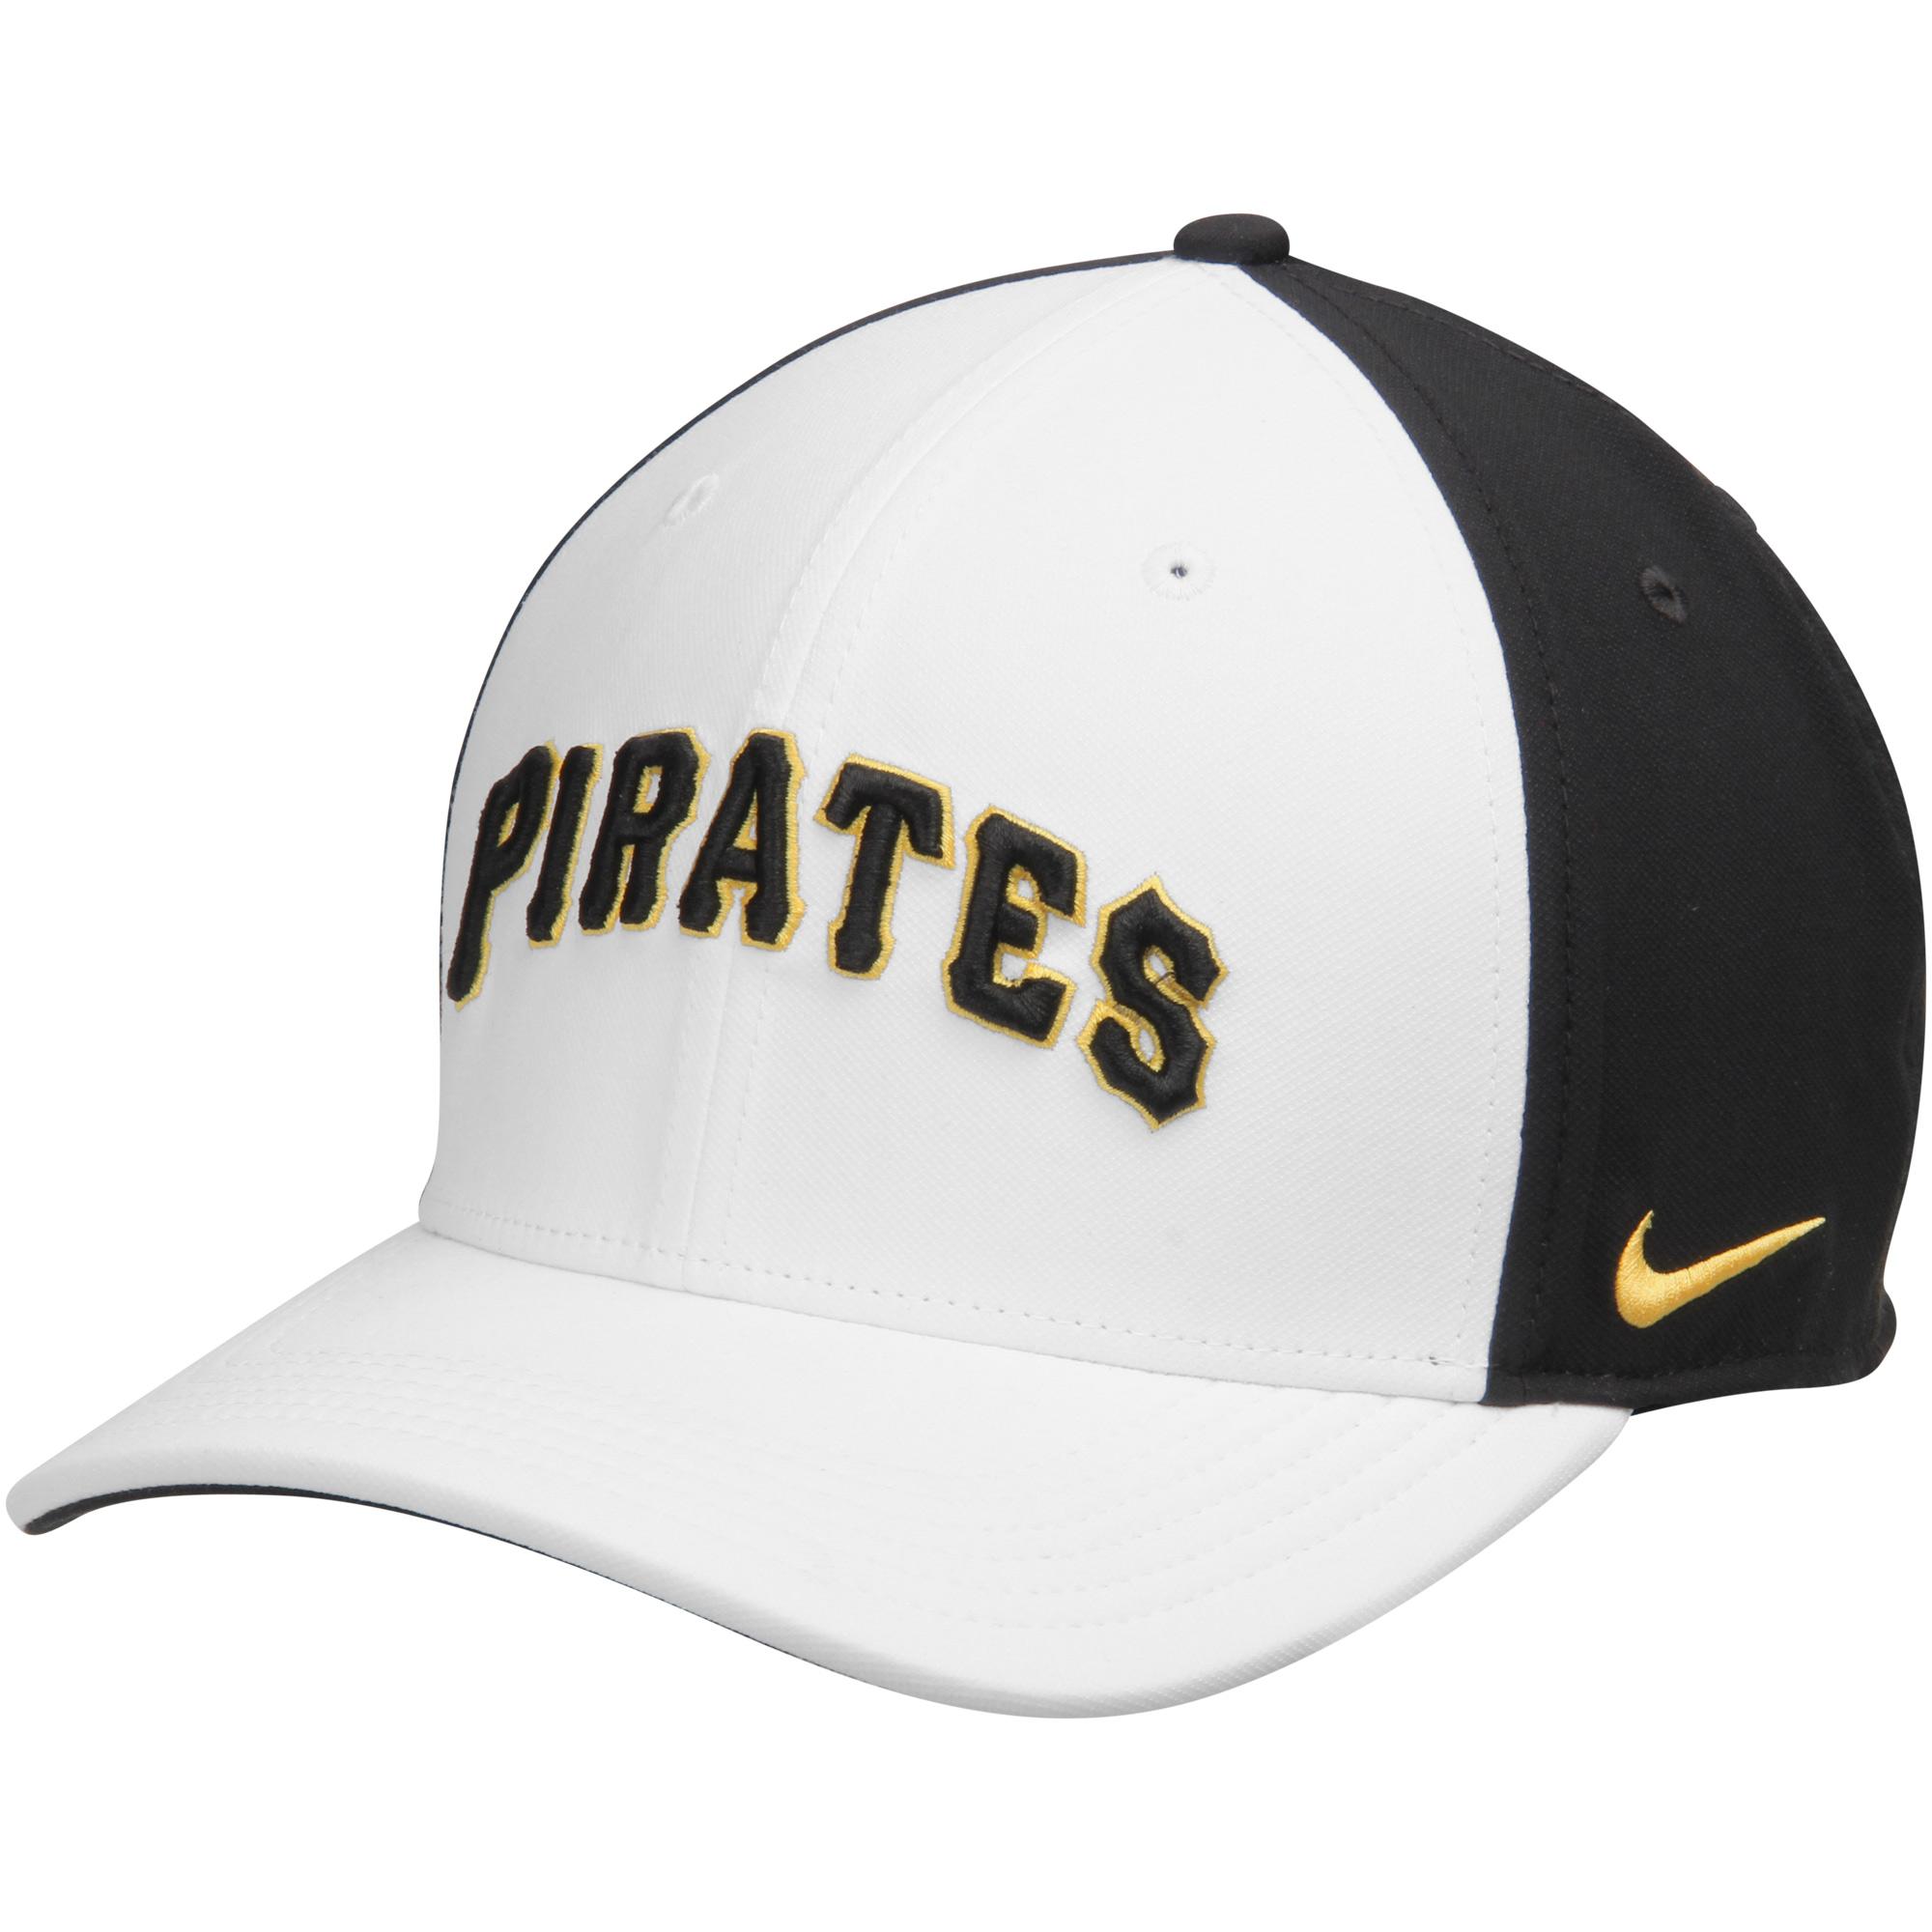 Pittsburgh Pirates Nike Color Vapor Classic Adjustable Hat - White/Black - OSFA